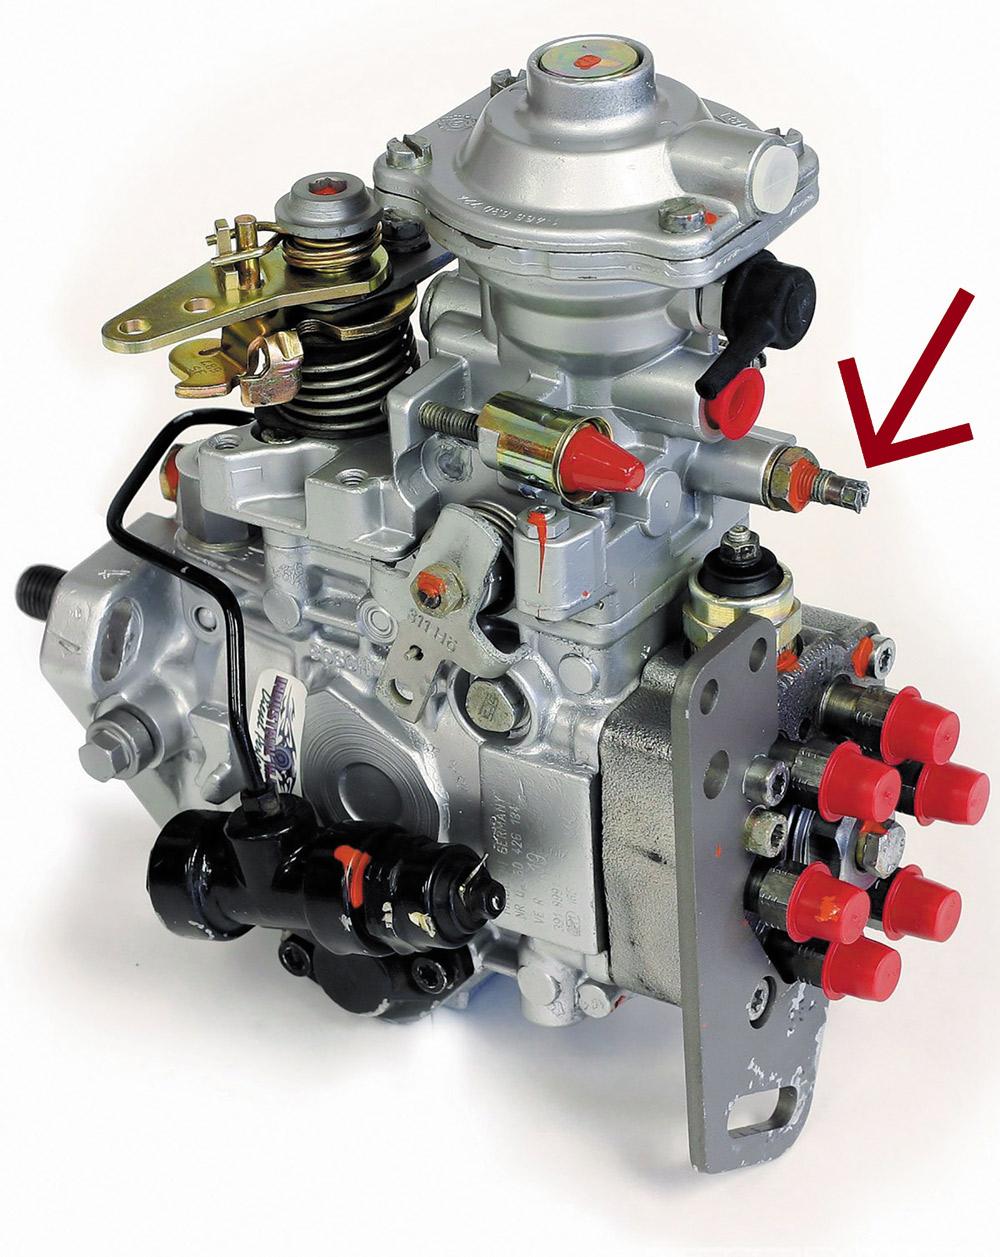 Fuel Screw on Dodge Cummins VE Fuel Pump